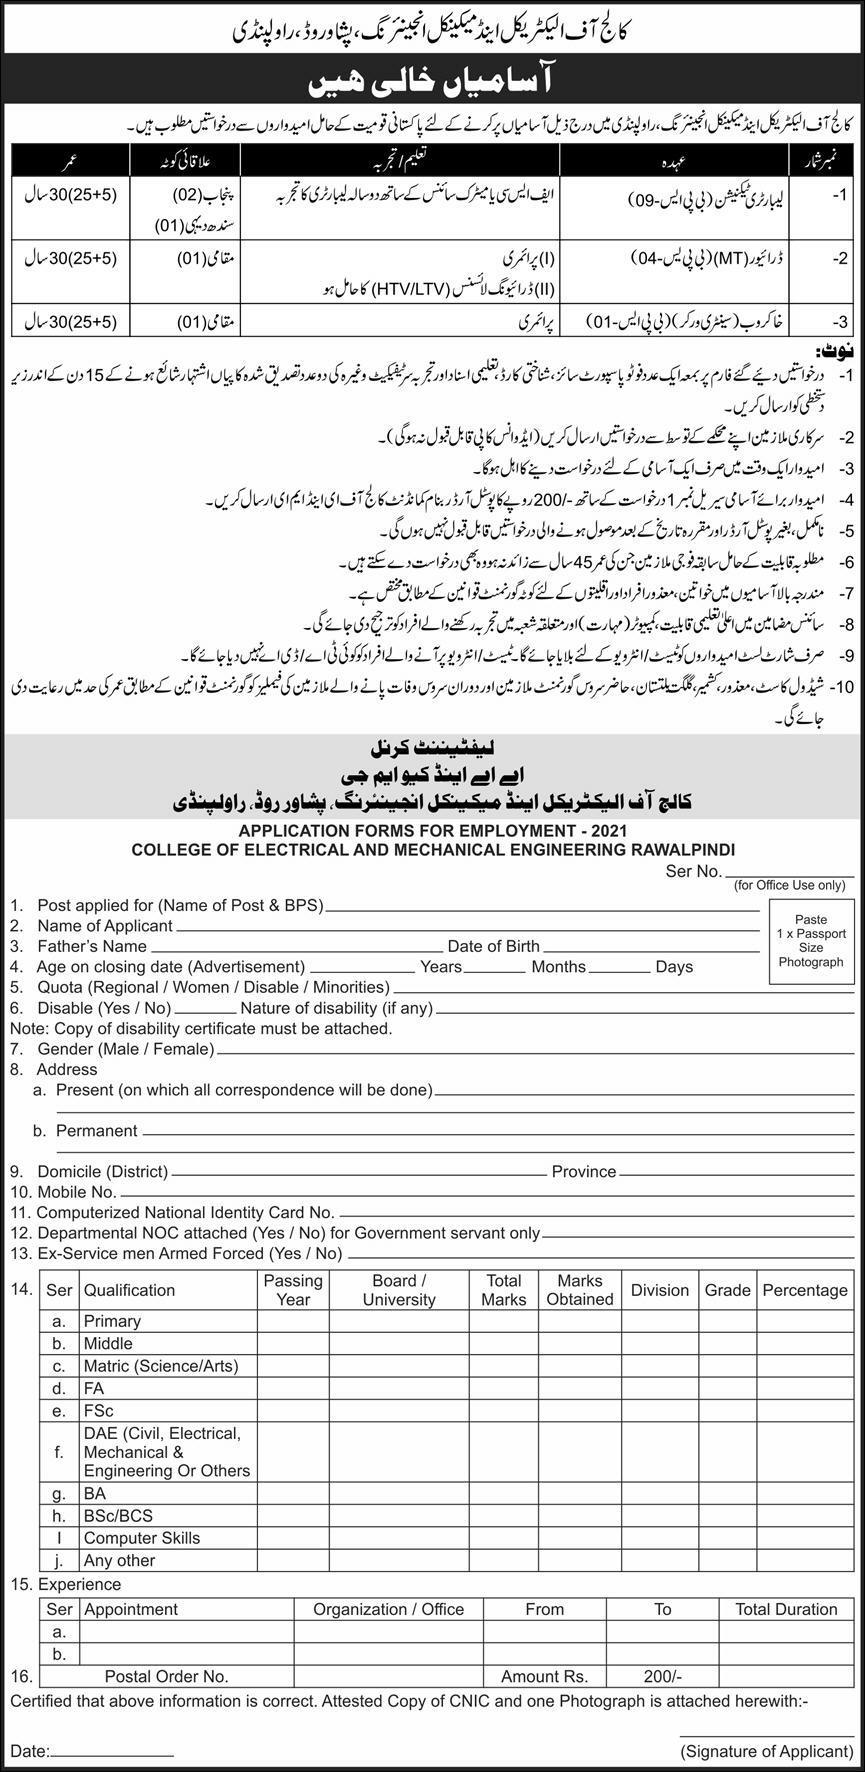 College of Electrical And Mechanical Engineering Rawalpindi Jobs 2021 in Pakistan